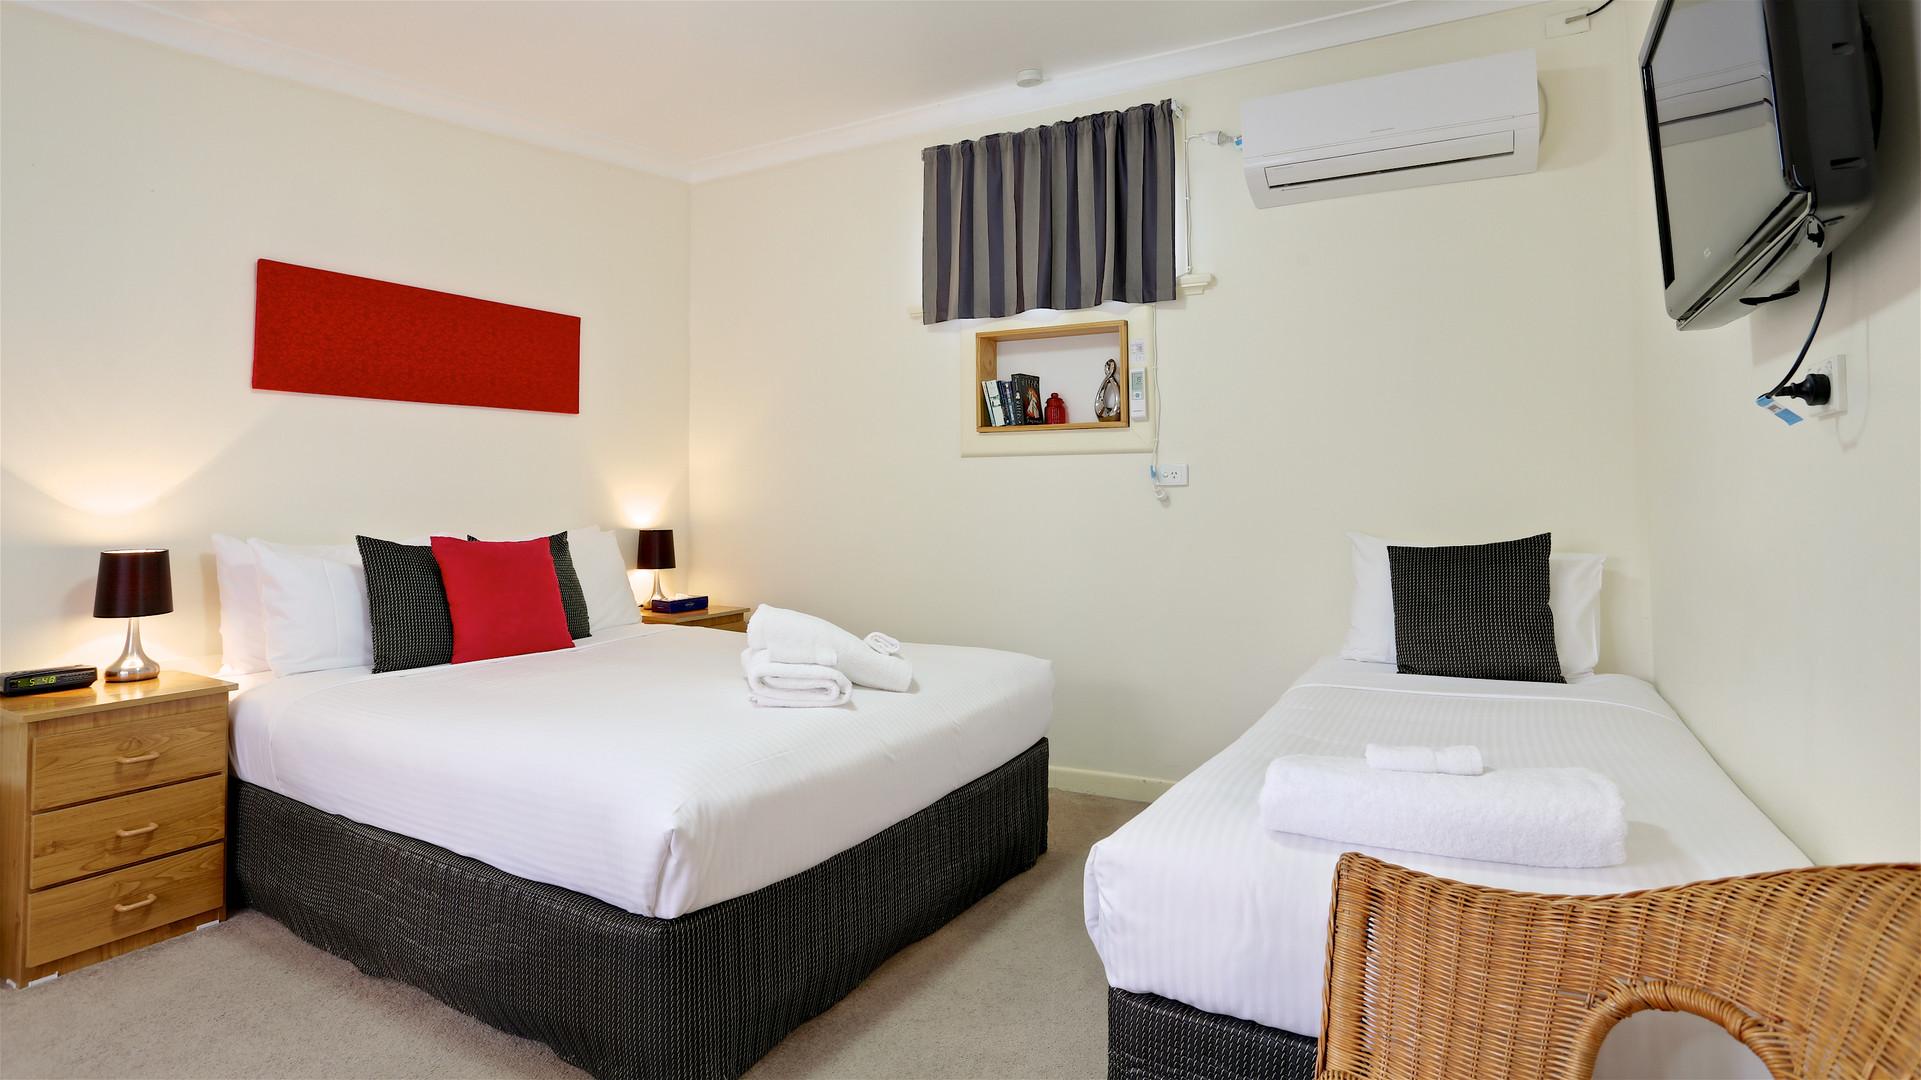 Room 134.jpg